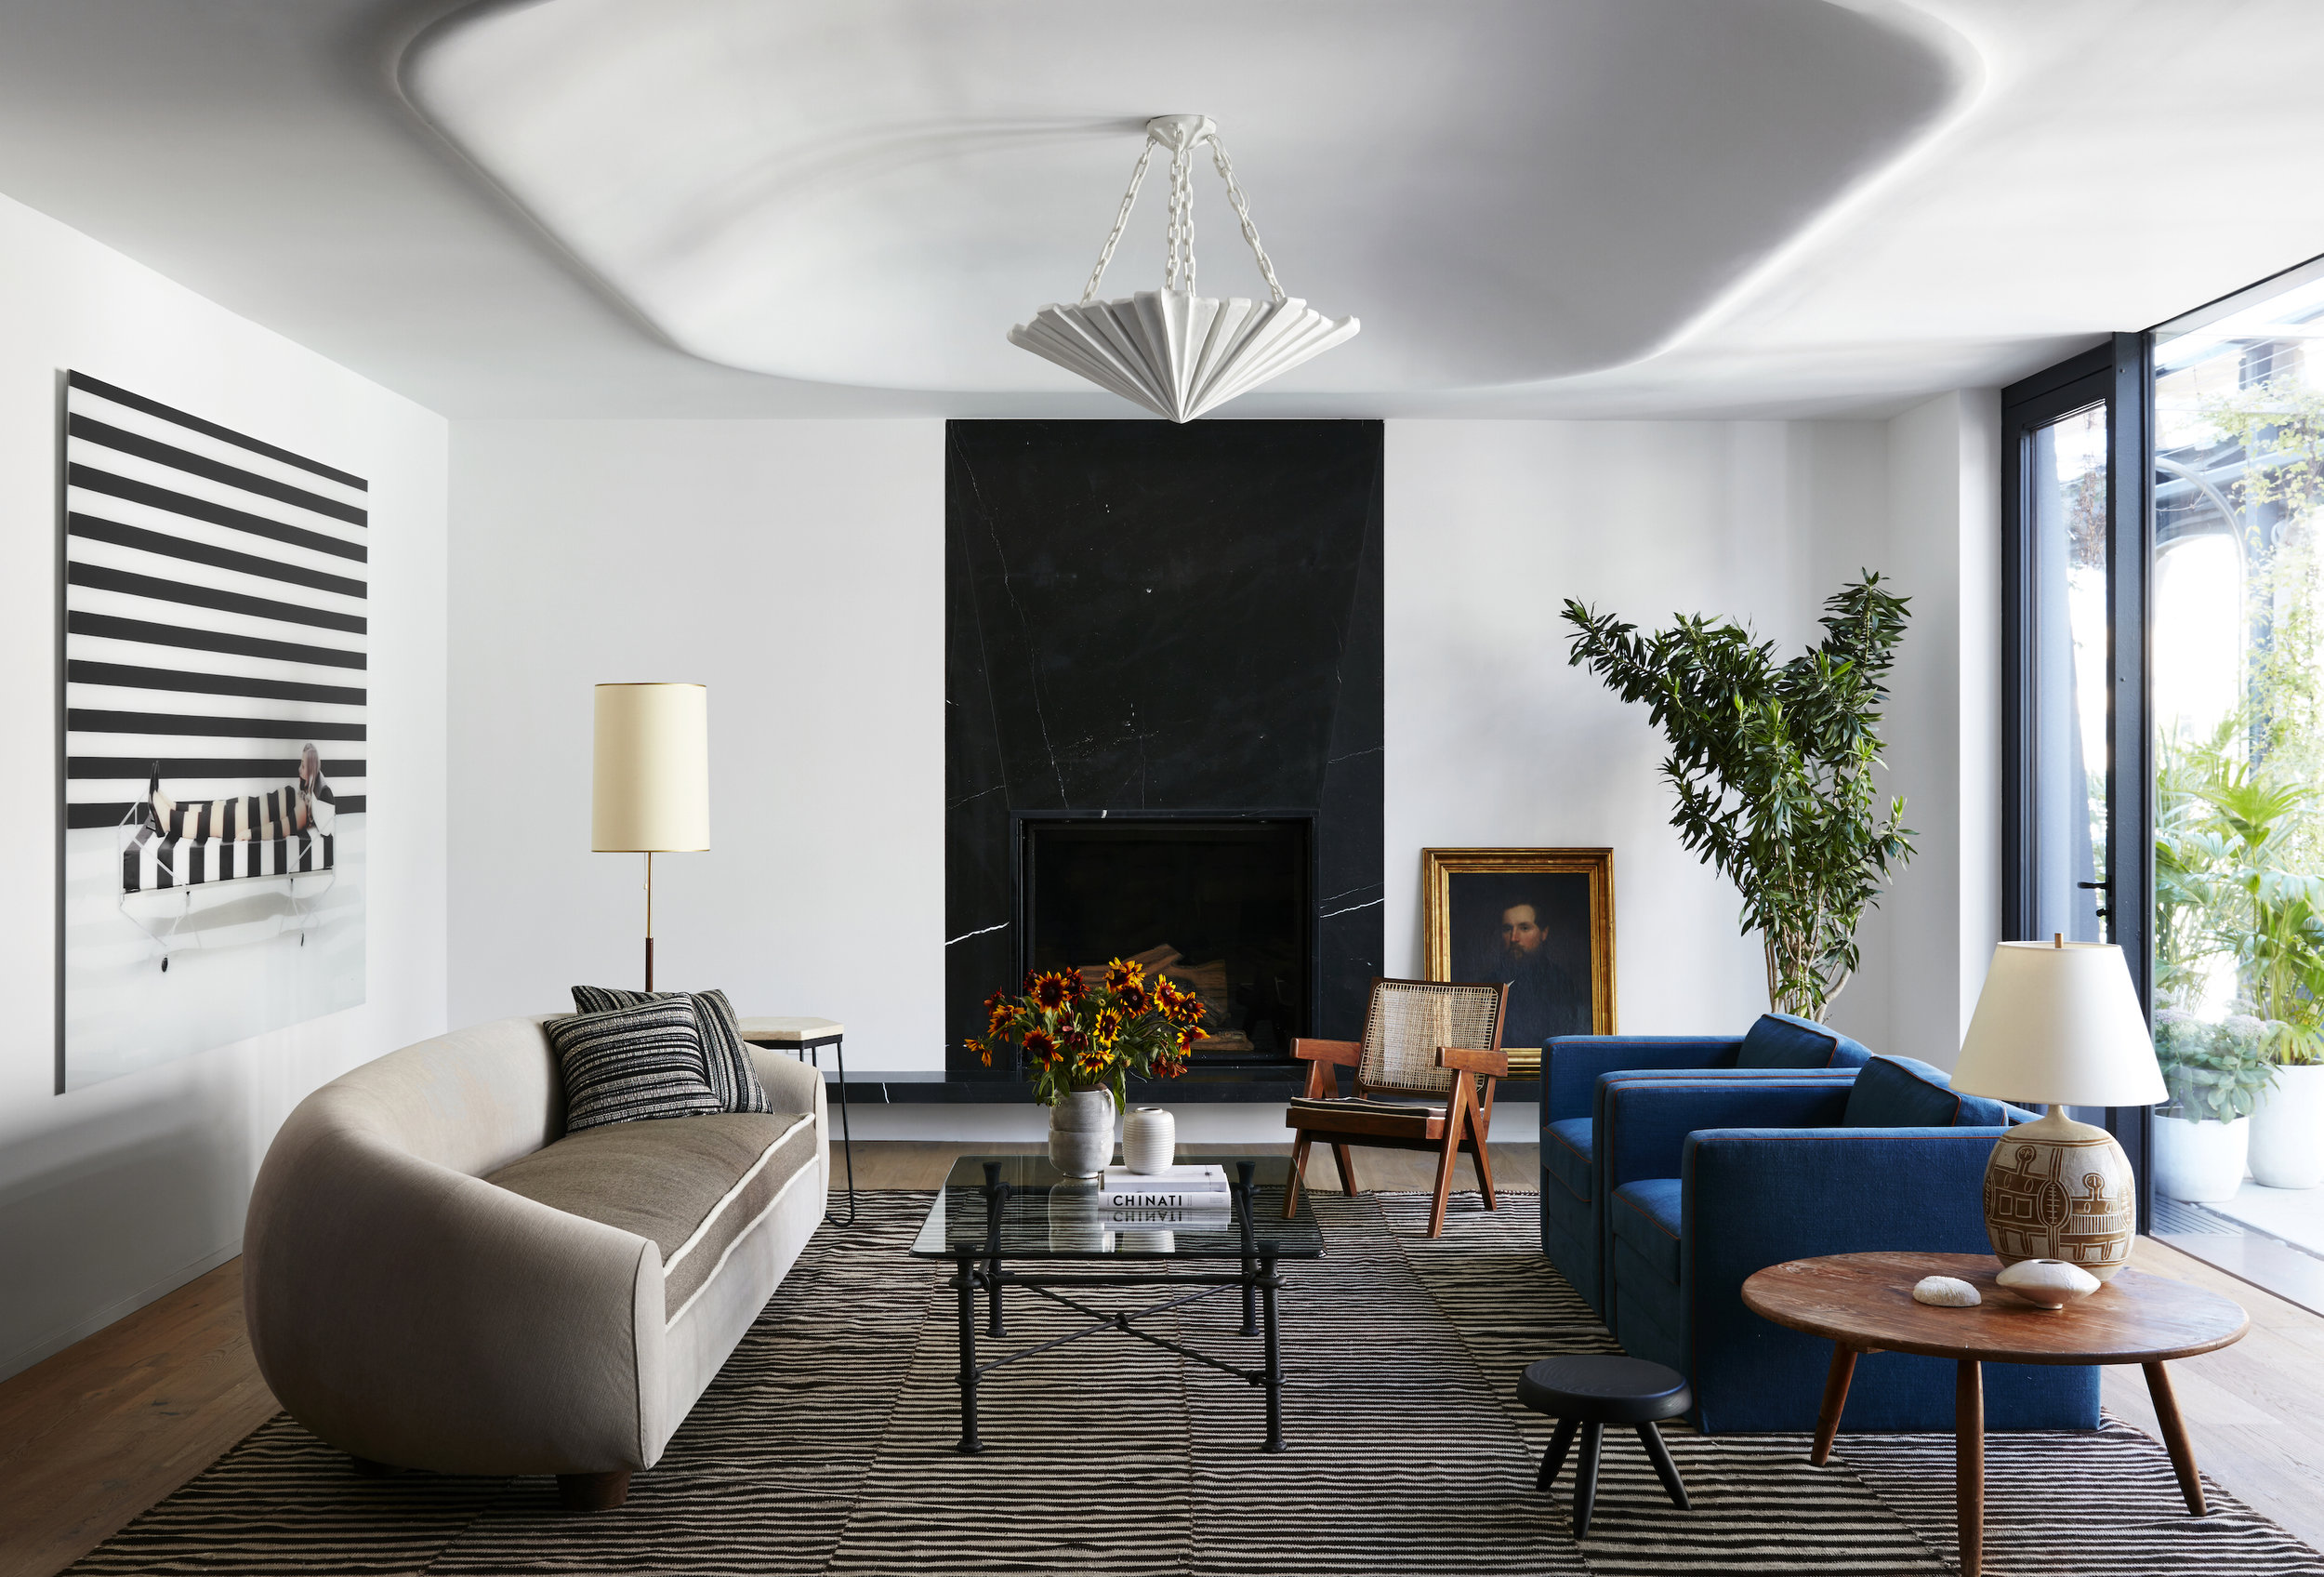 James Pendant  Xoco, by DDG, interior designed by Neal Beckstedt Studio. Photographer: Stephen Kent Johnson.